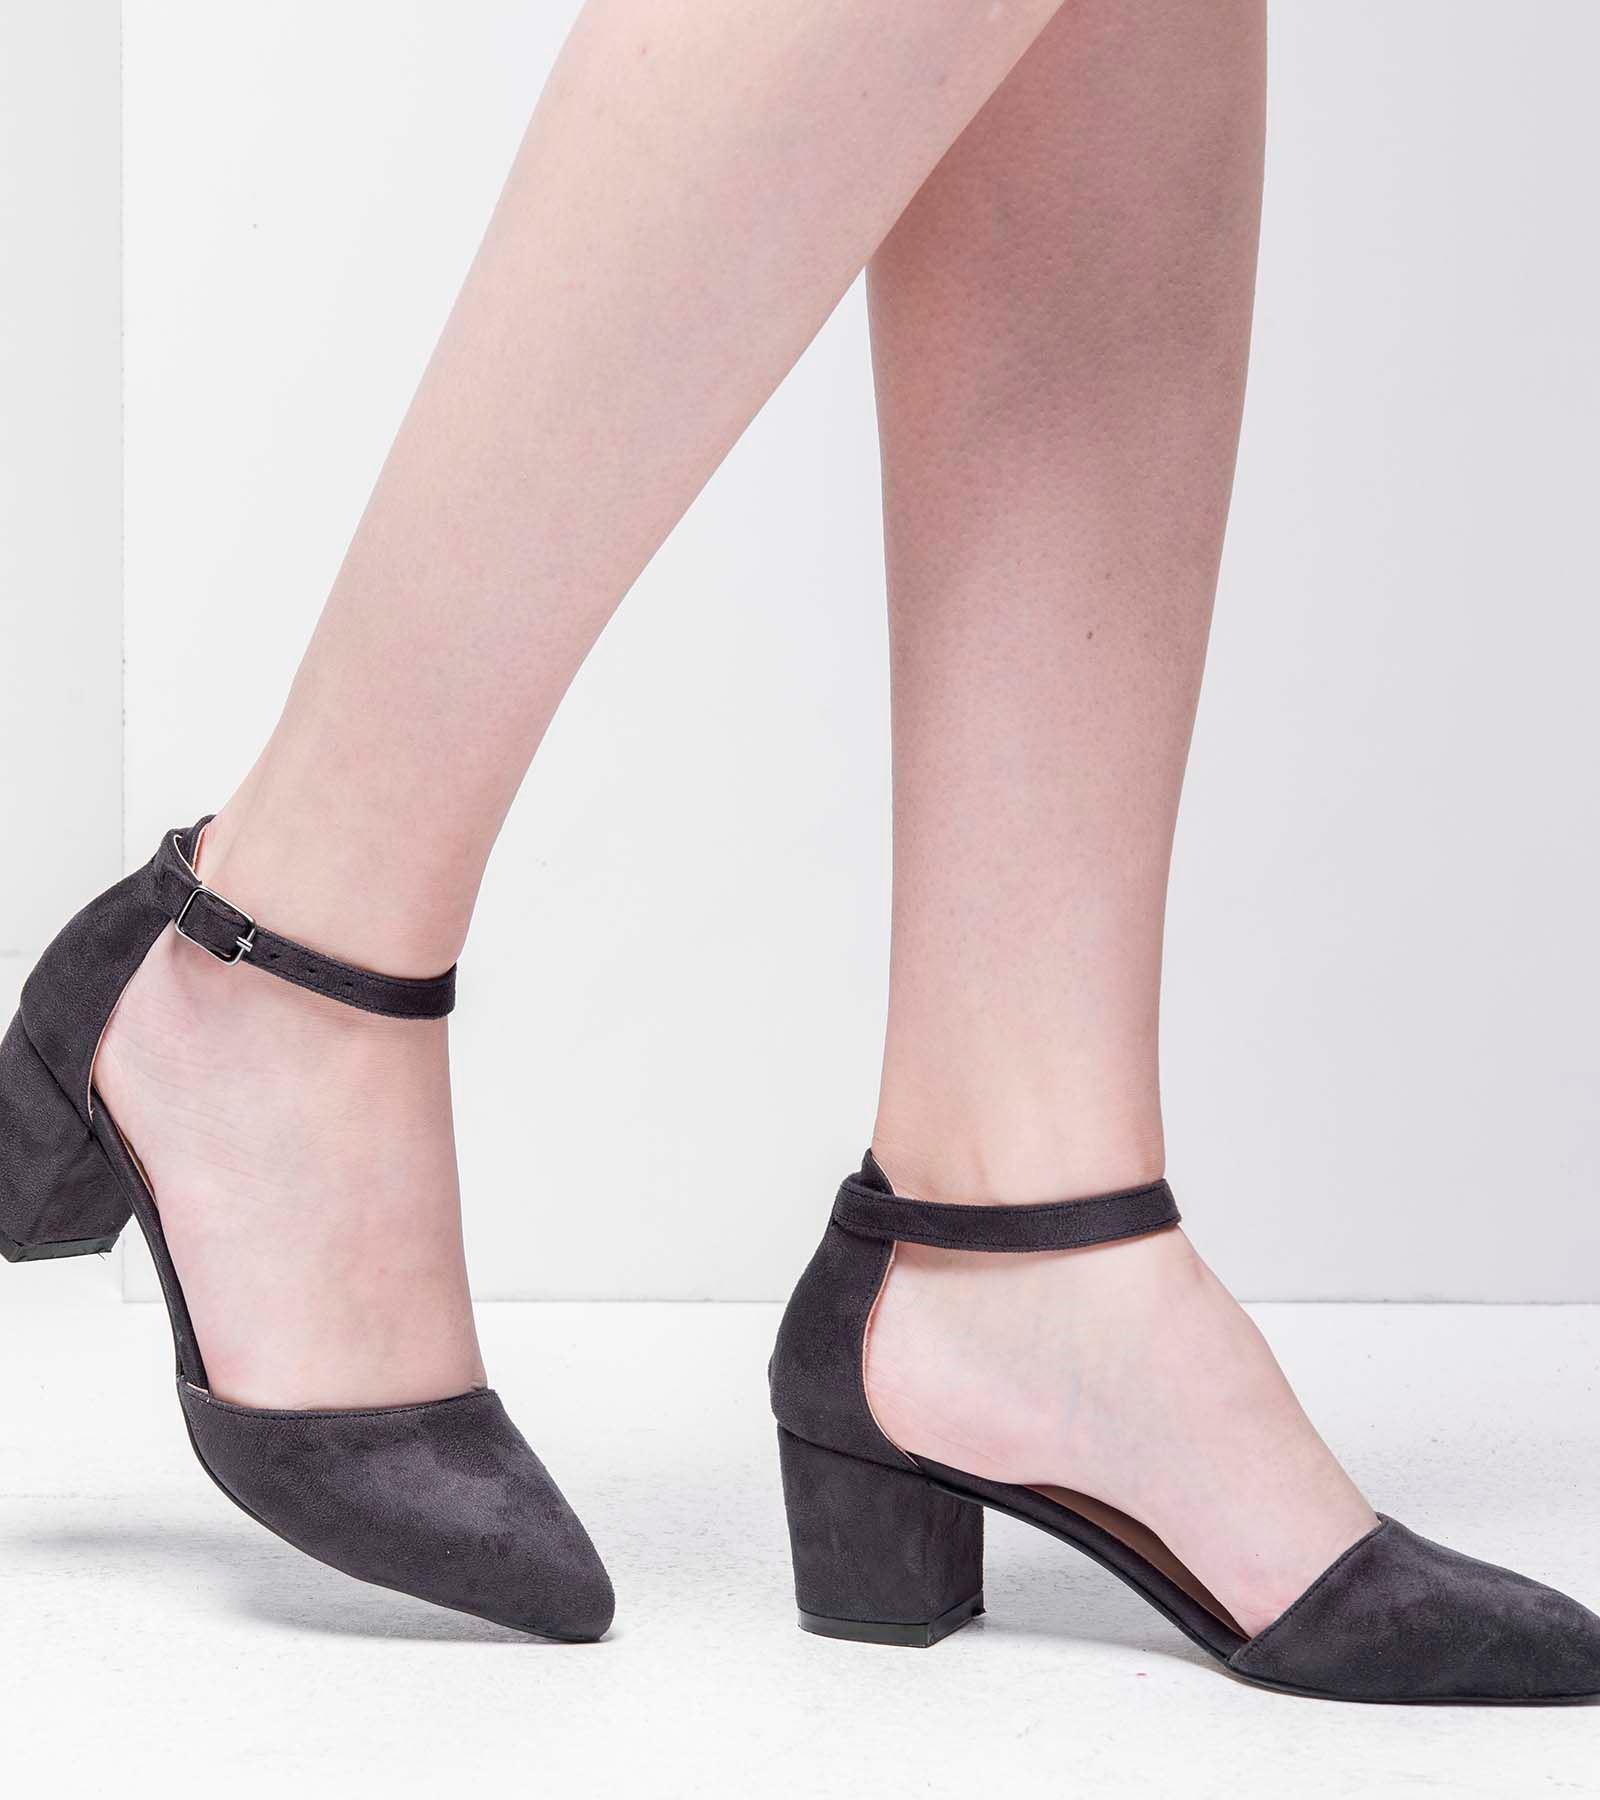 Anka Topuklu Süet Ayakkabı Koyu Siyah